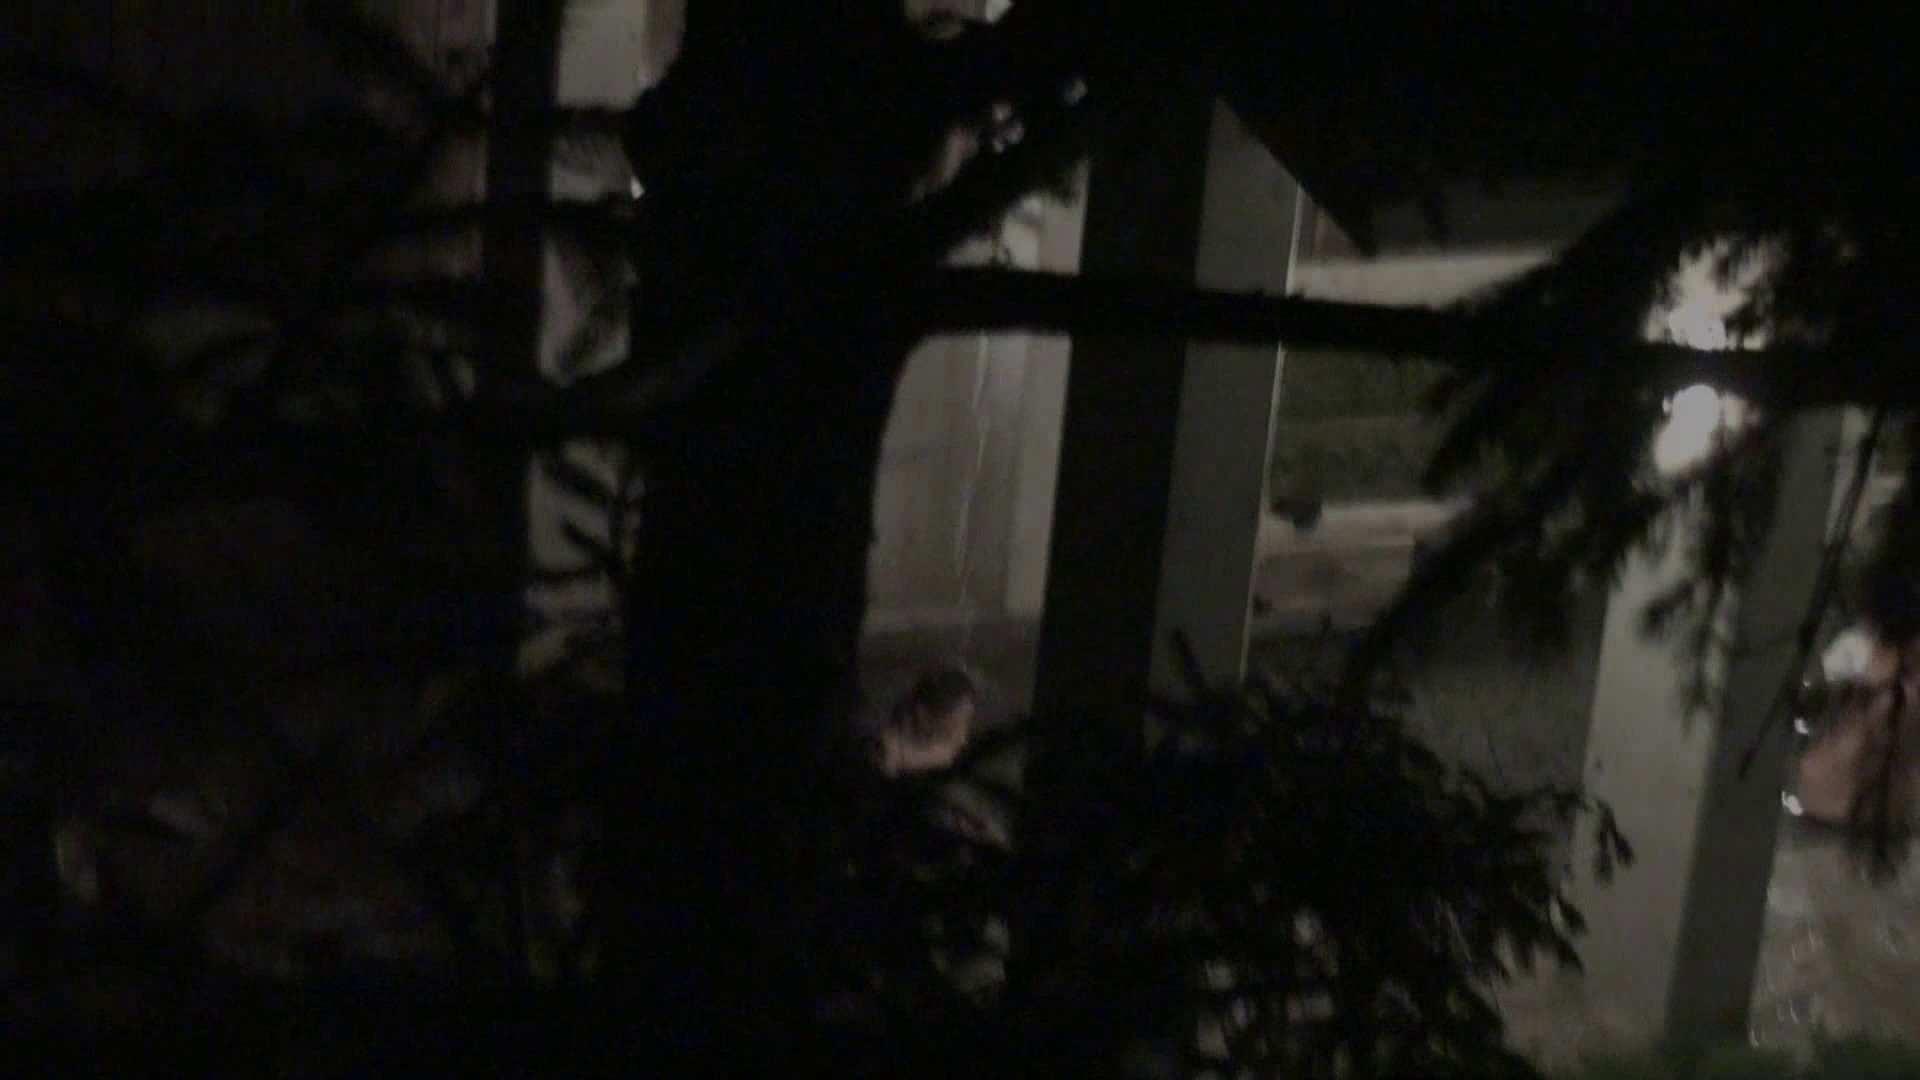 Aquaな露天風呂Vol.402 盗撮 ヌード画像 88画像 83